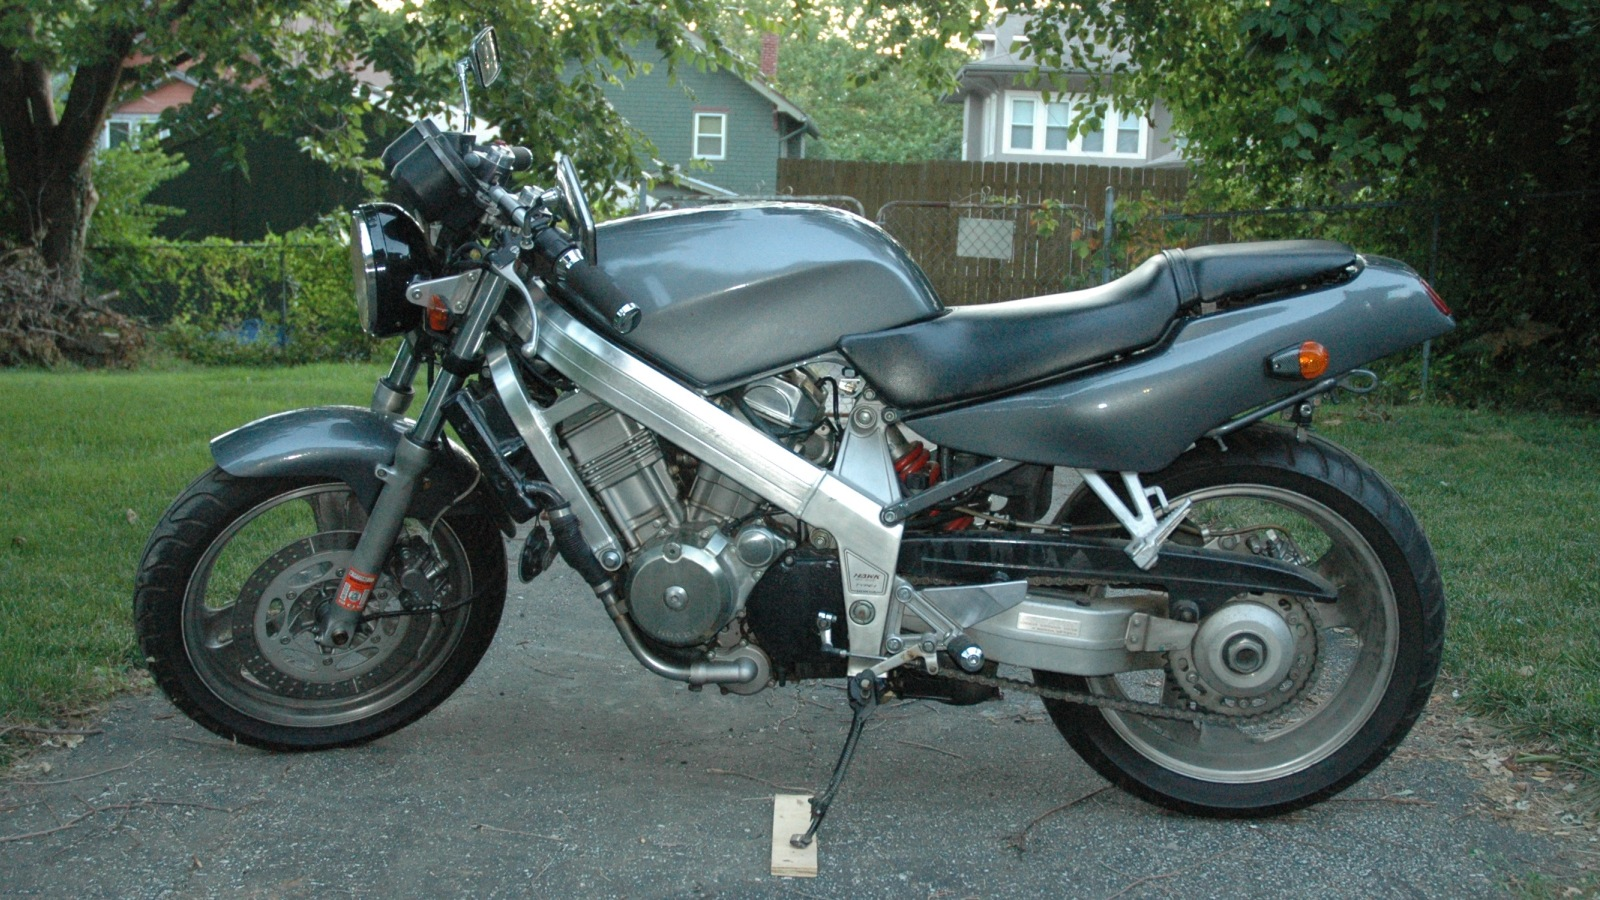 craigslist st louis motorcycle parts | Newmotorjdi.co